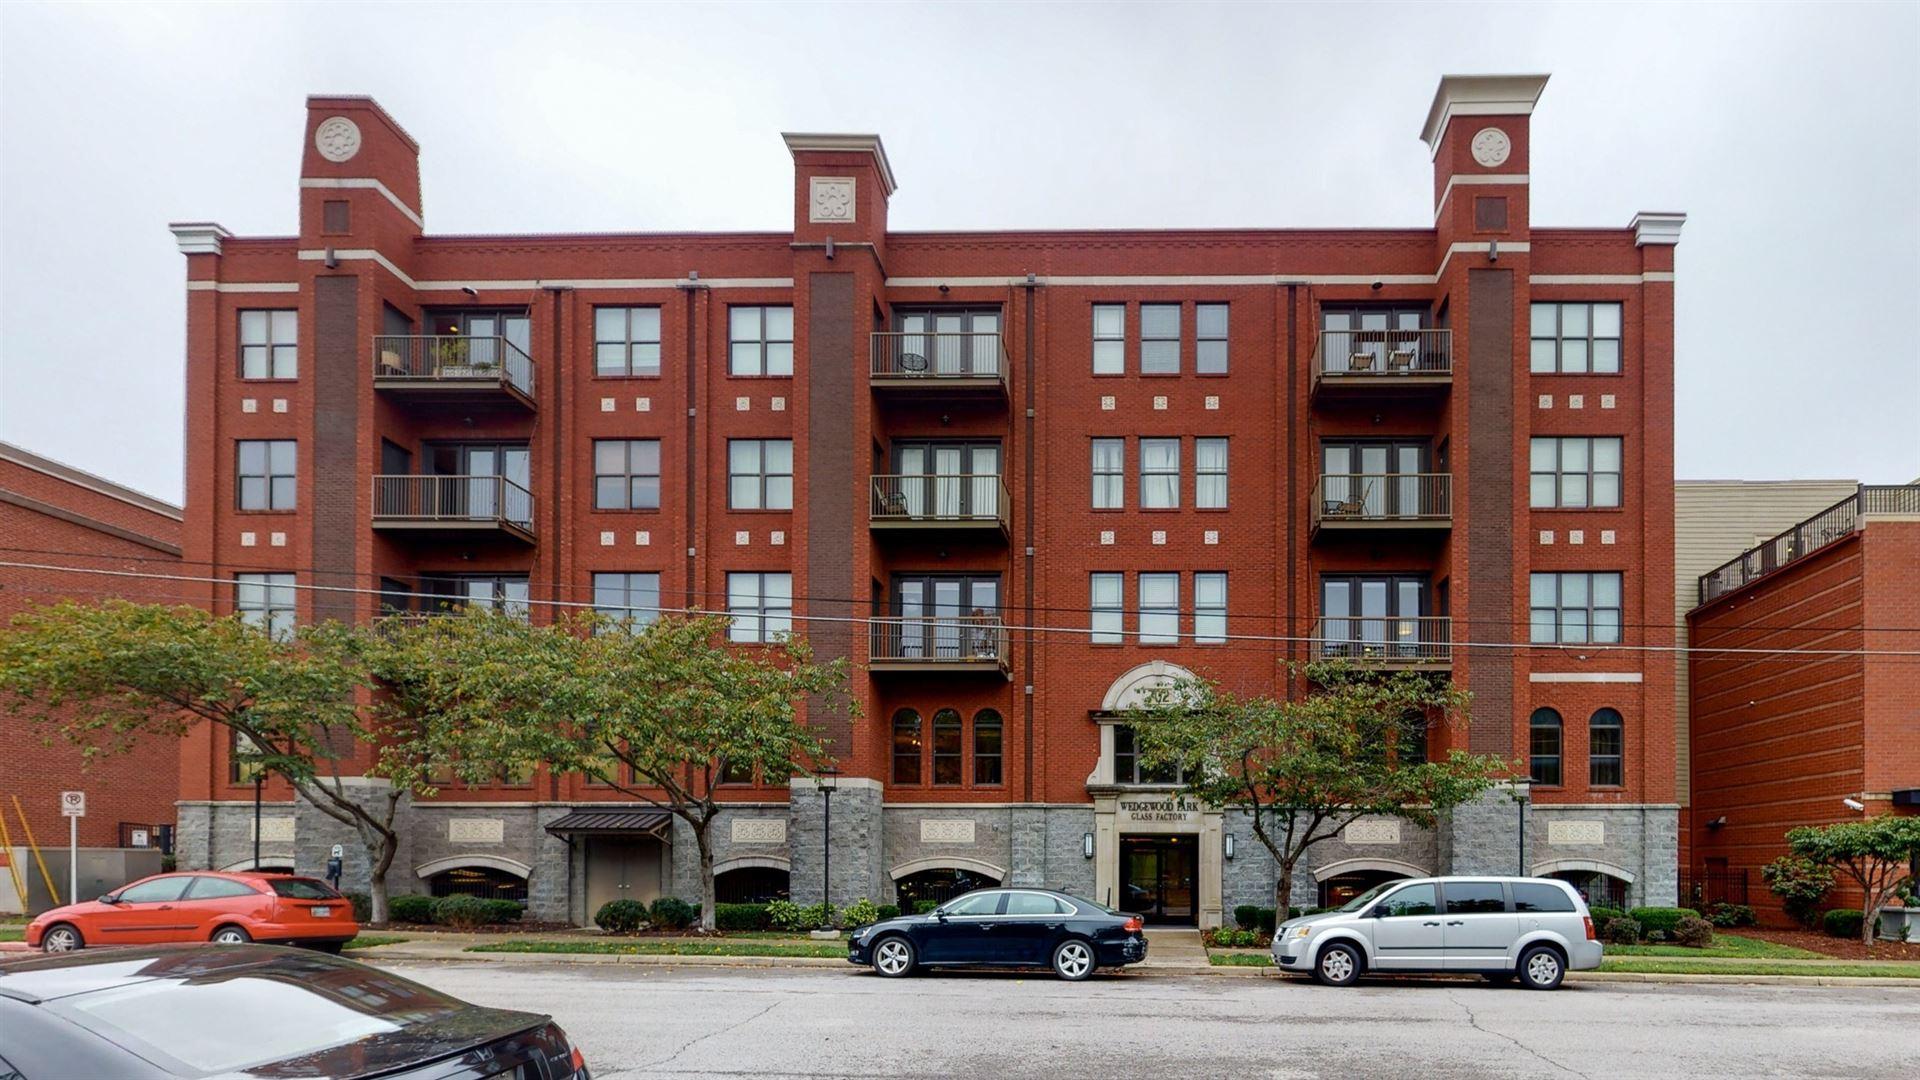 702 Wedgewood Park #301, Nashville, TN 37203 - MLS#: 2209880